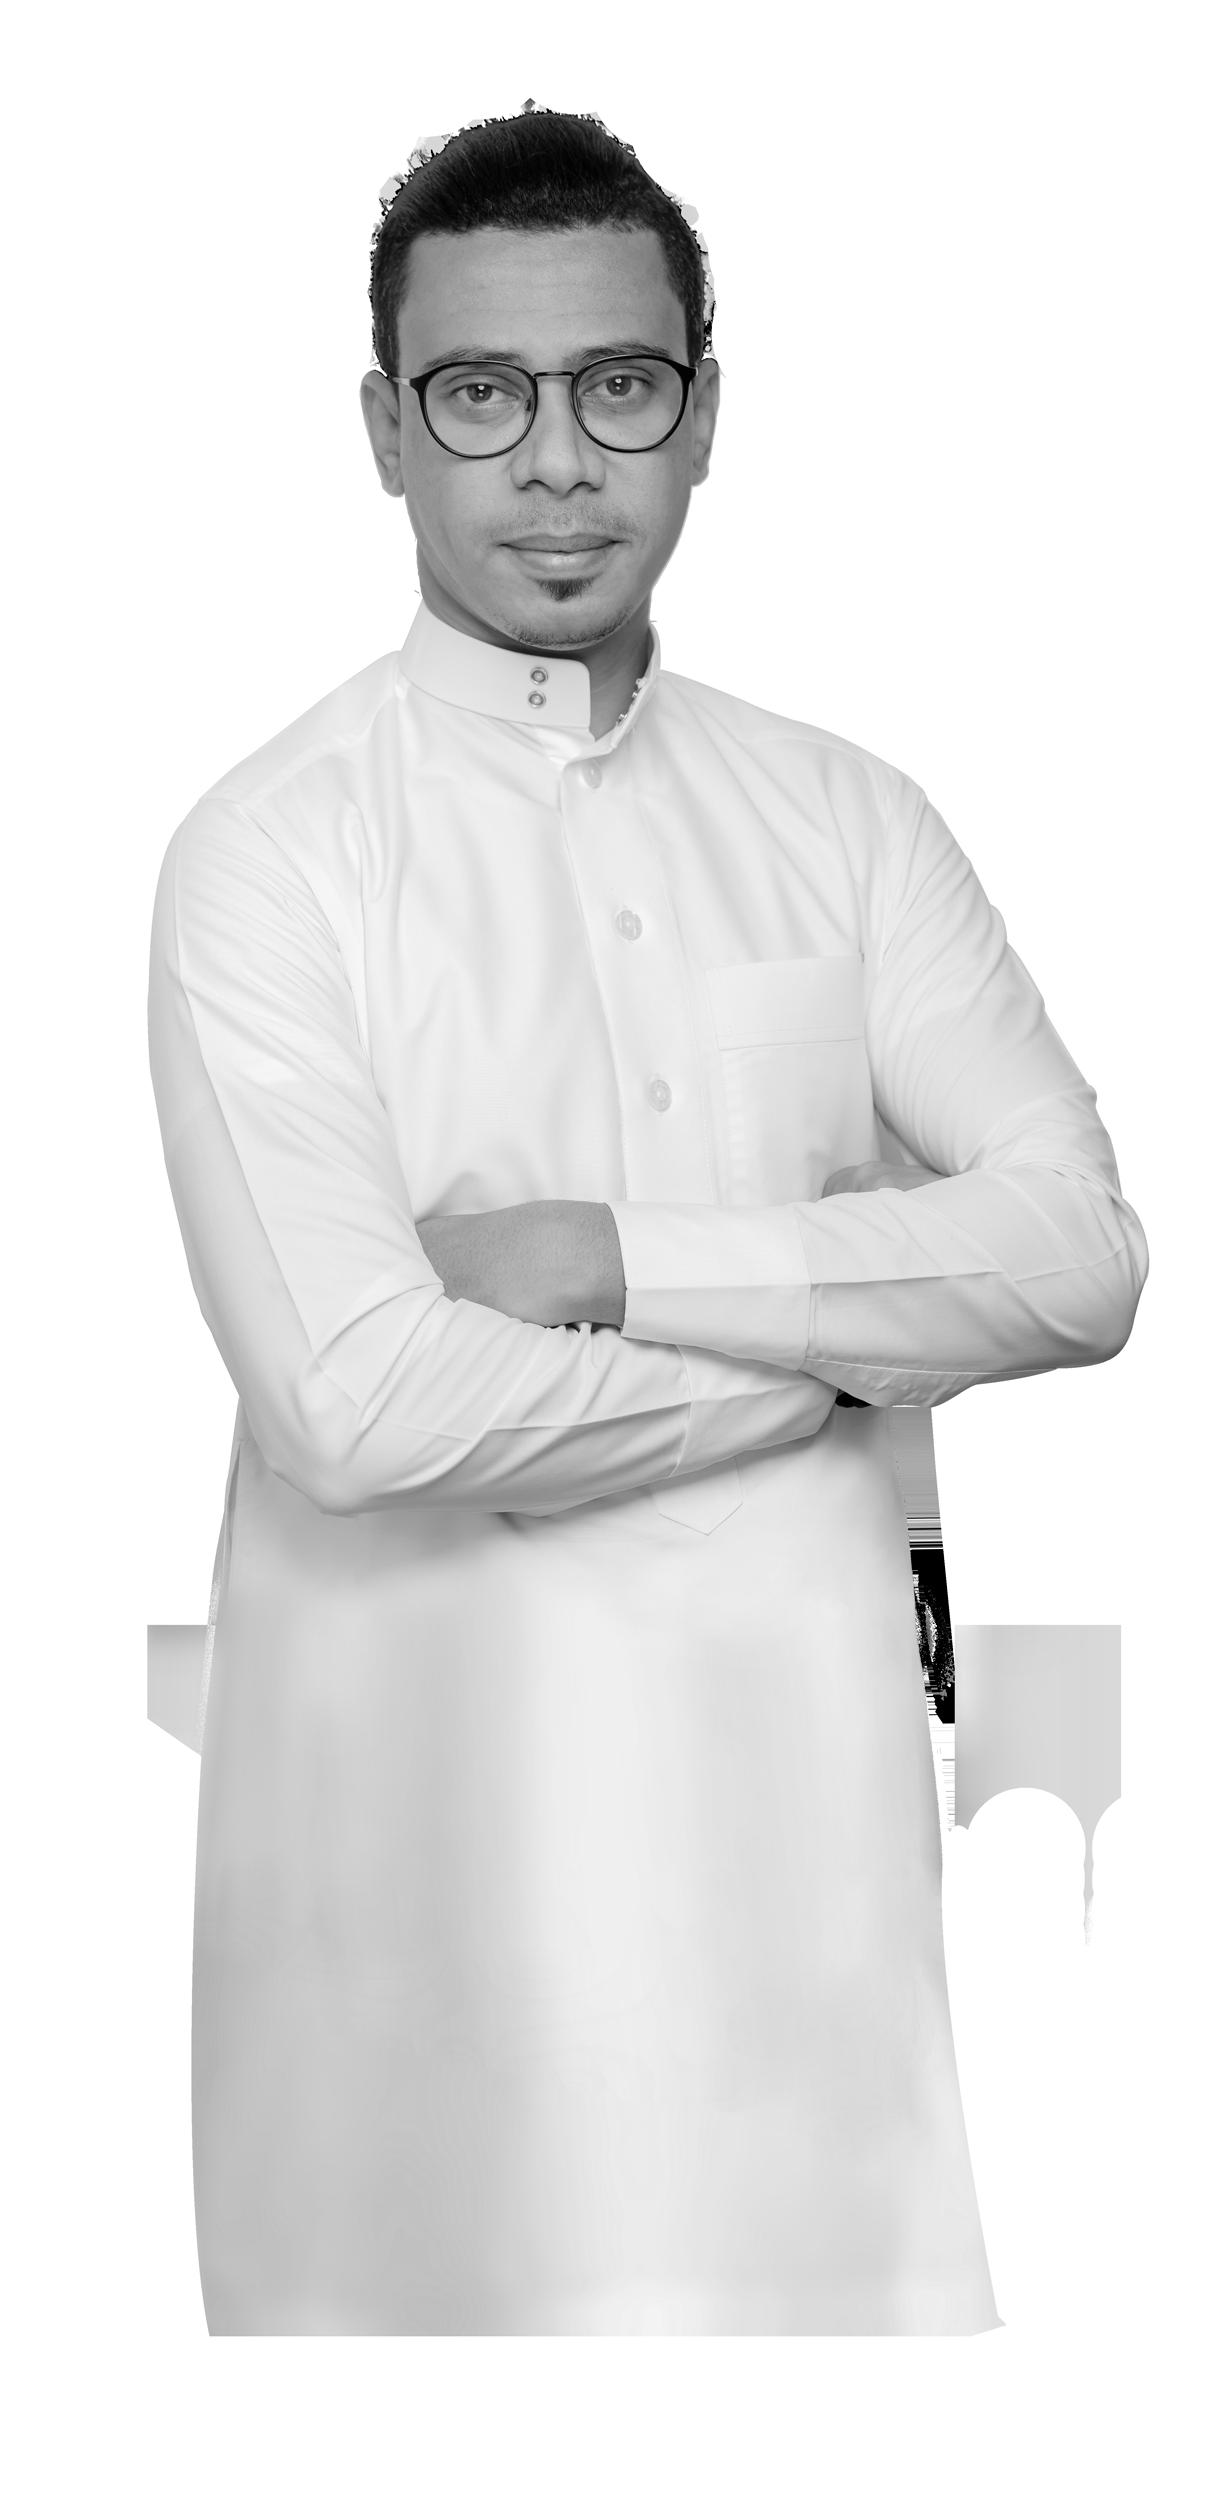 ياسر قنيوي